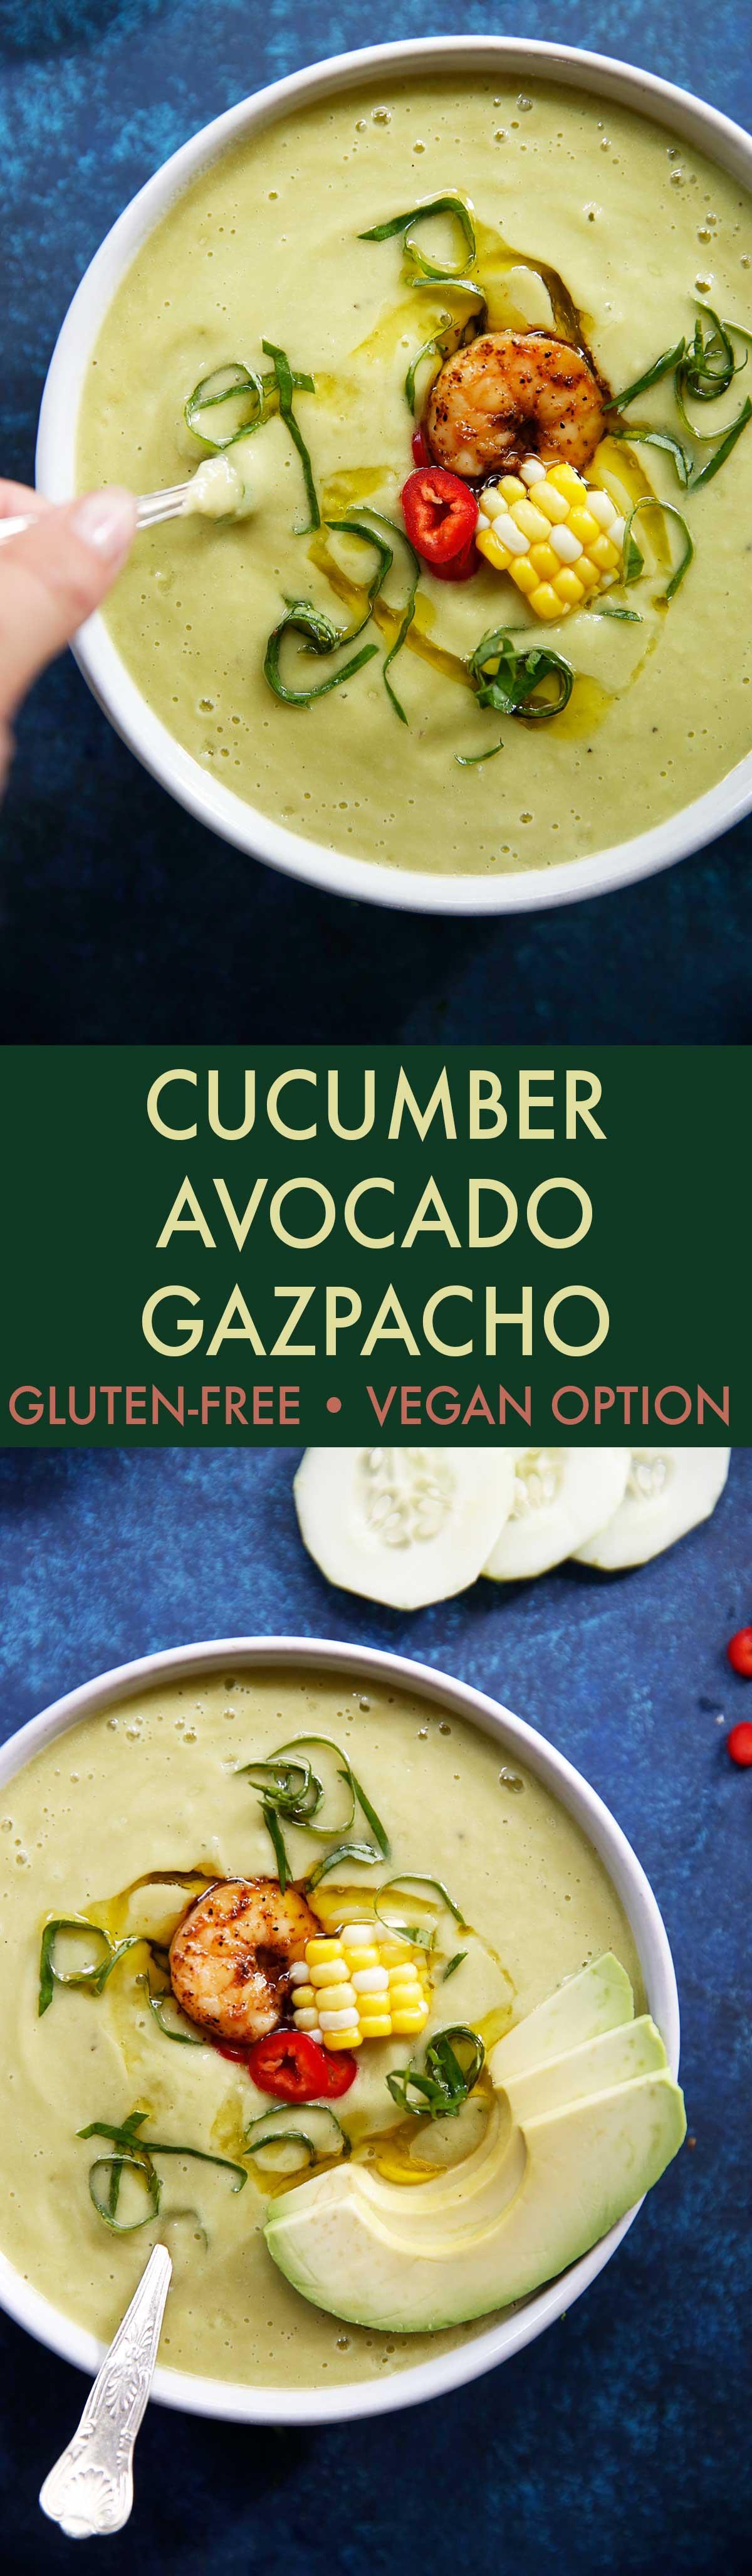 Avocado Gazpacho with Cajun Chili Shrimp   Lexi's Clean Kitchen